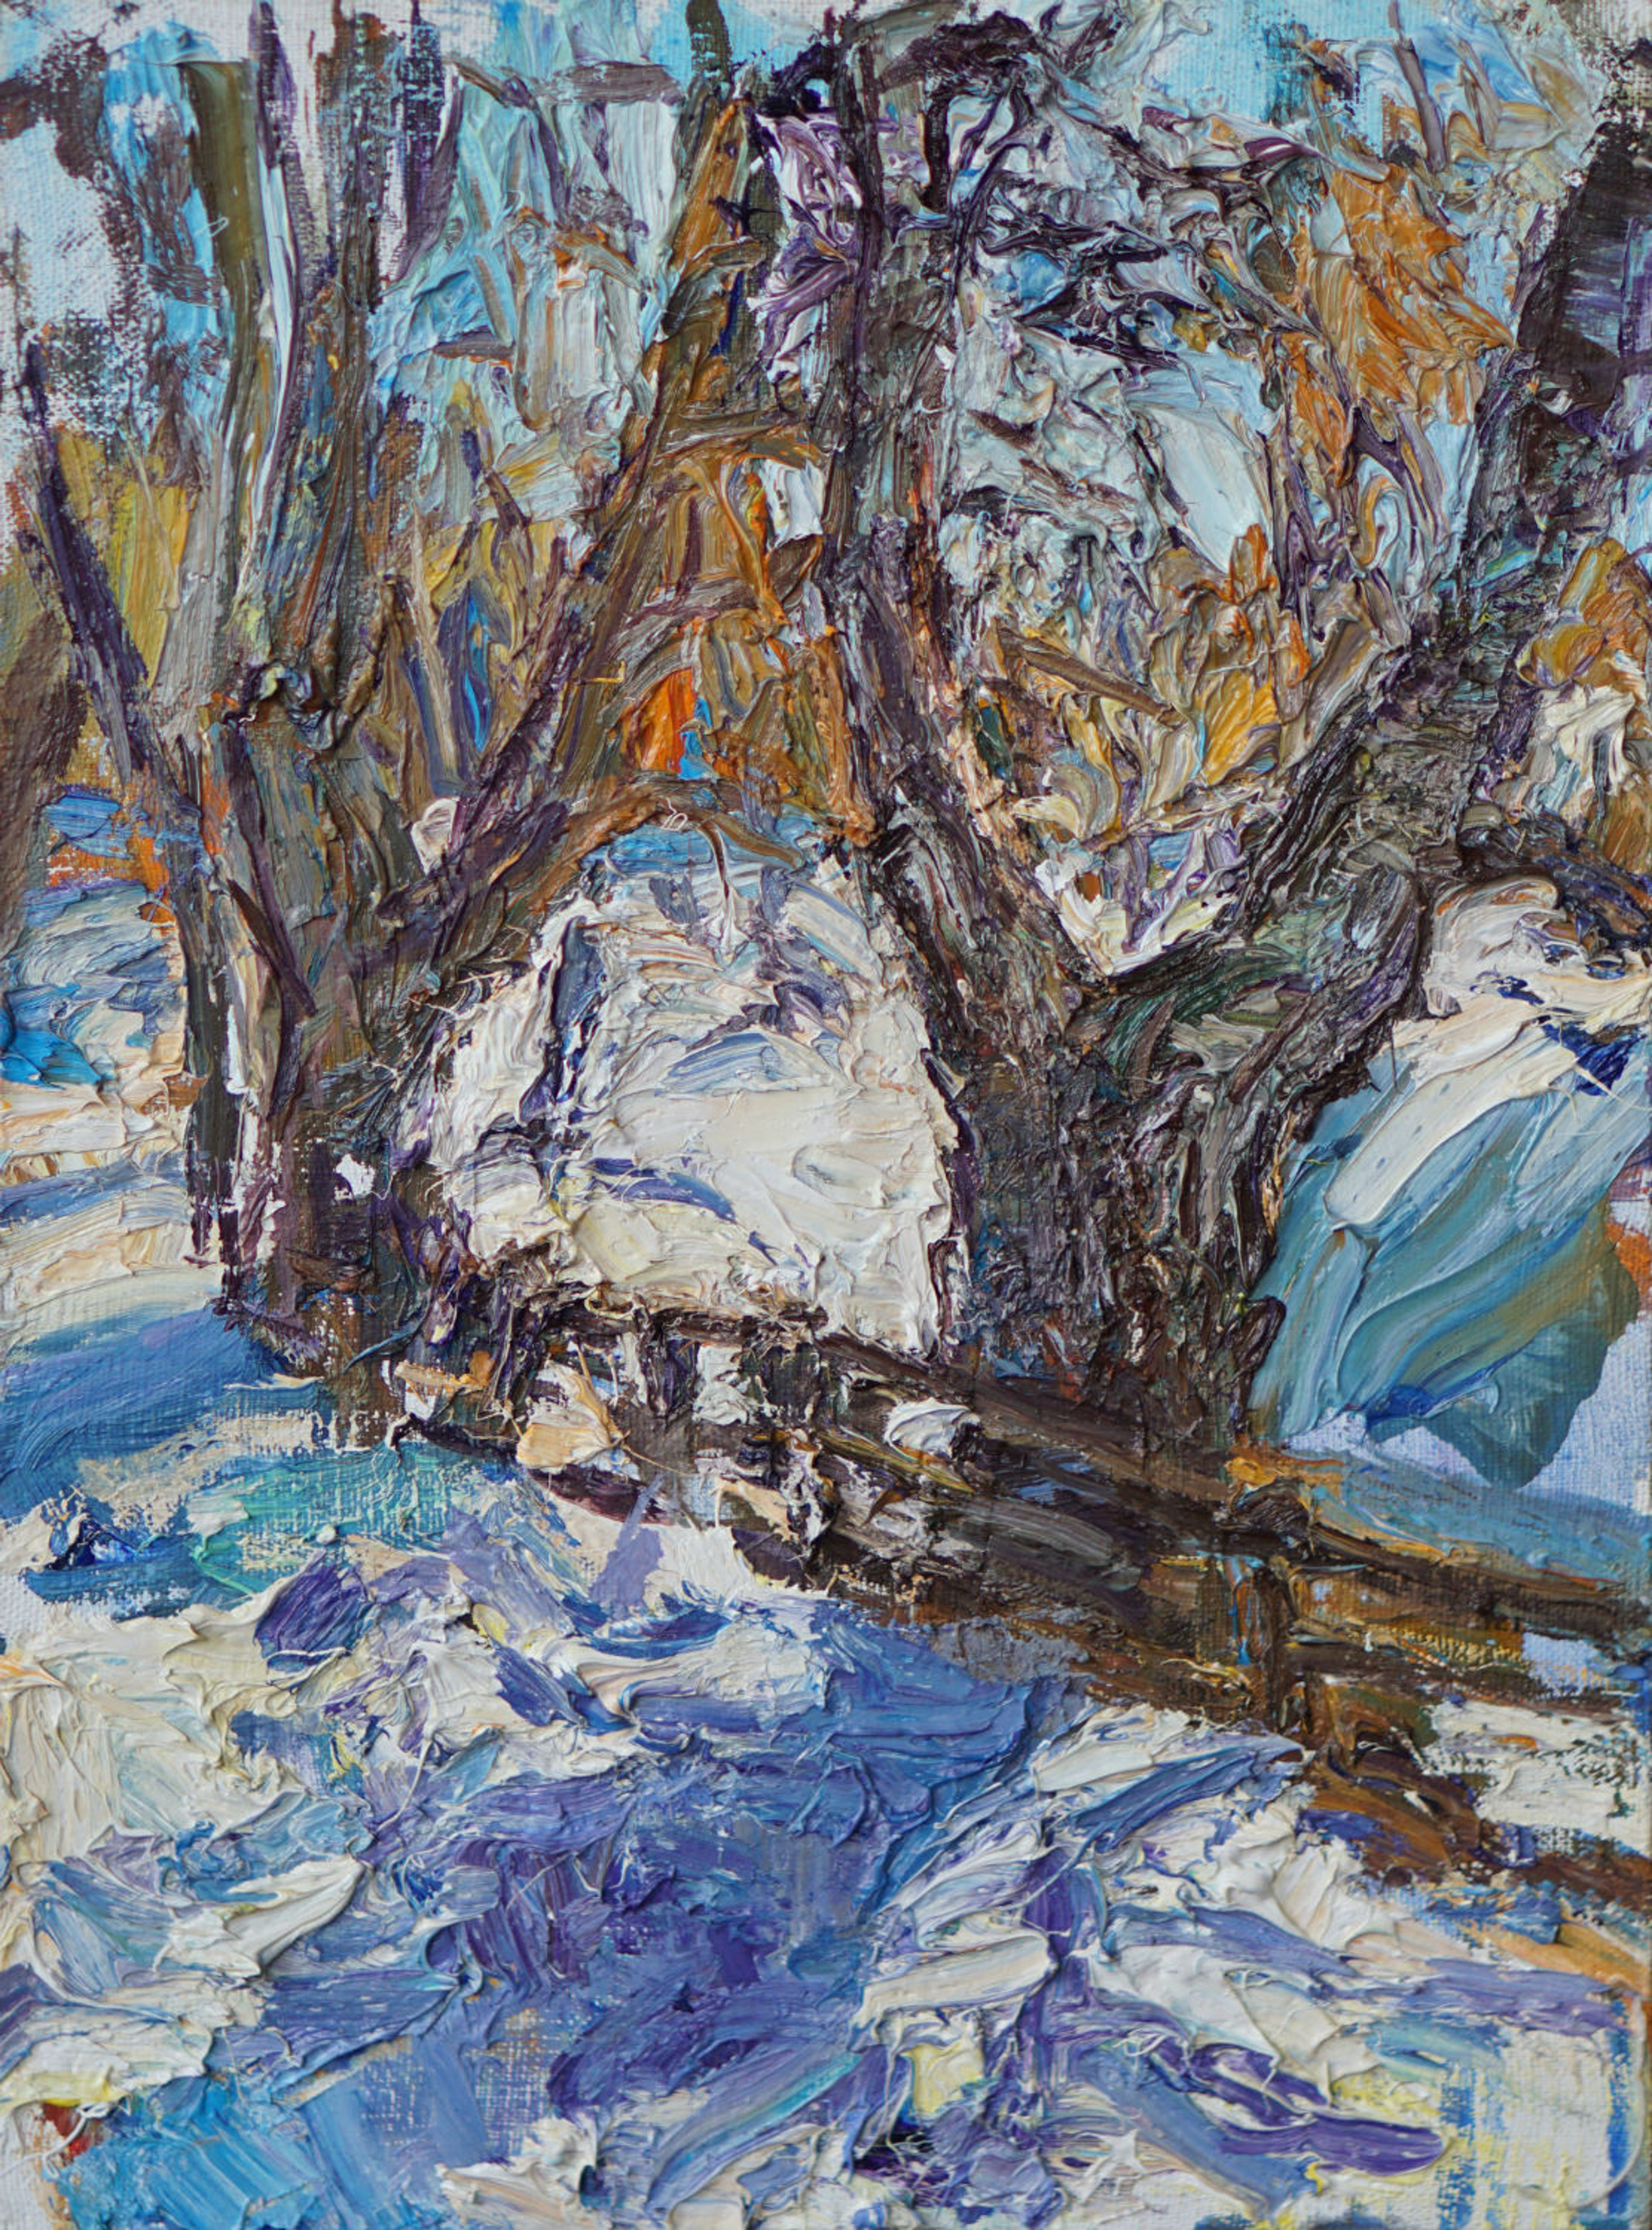 Small Winter Scene by Ulrich Gleiter